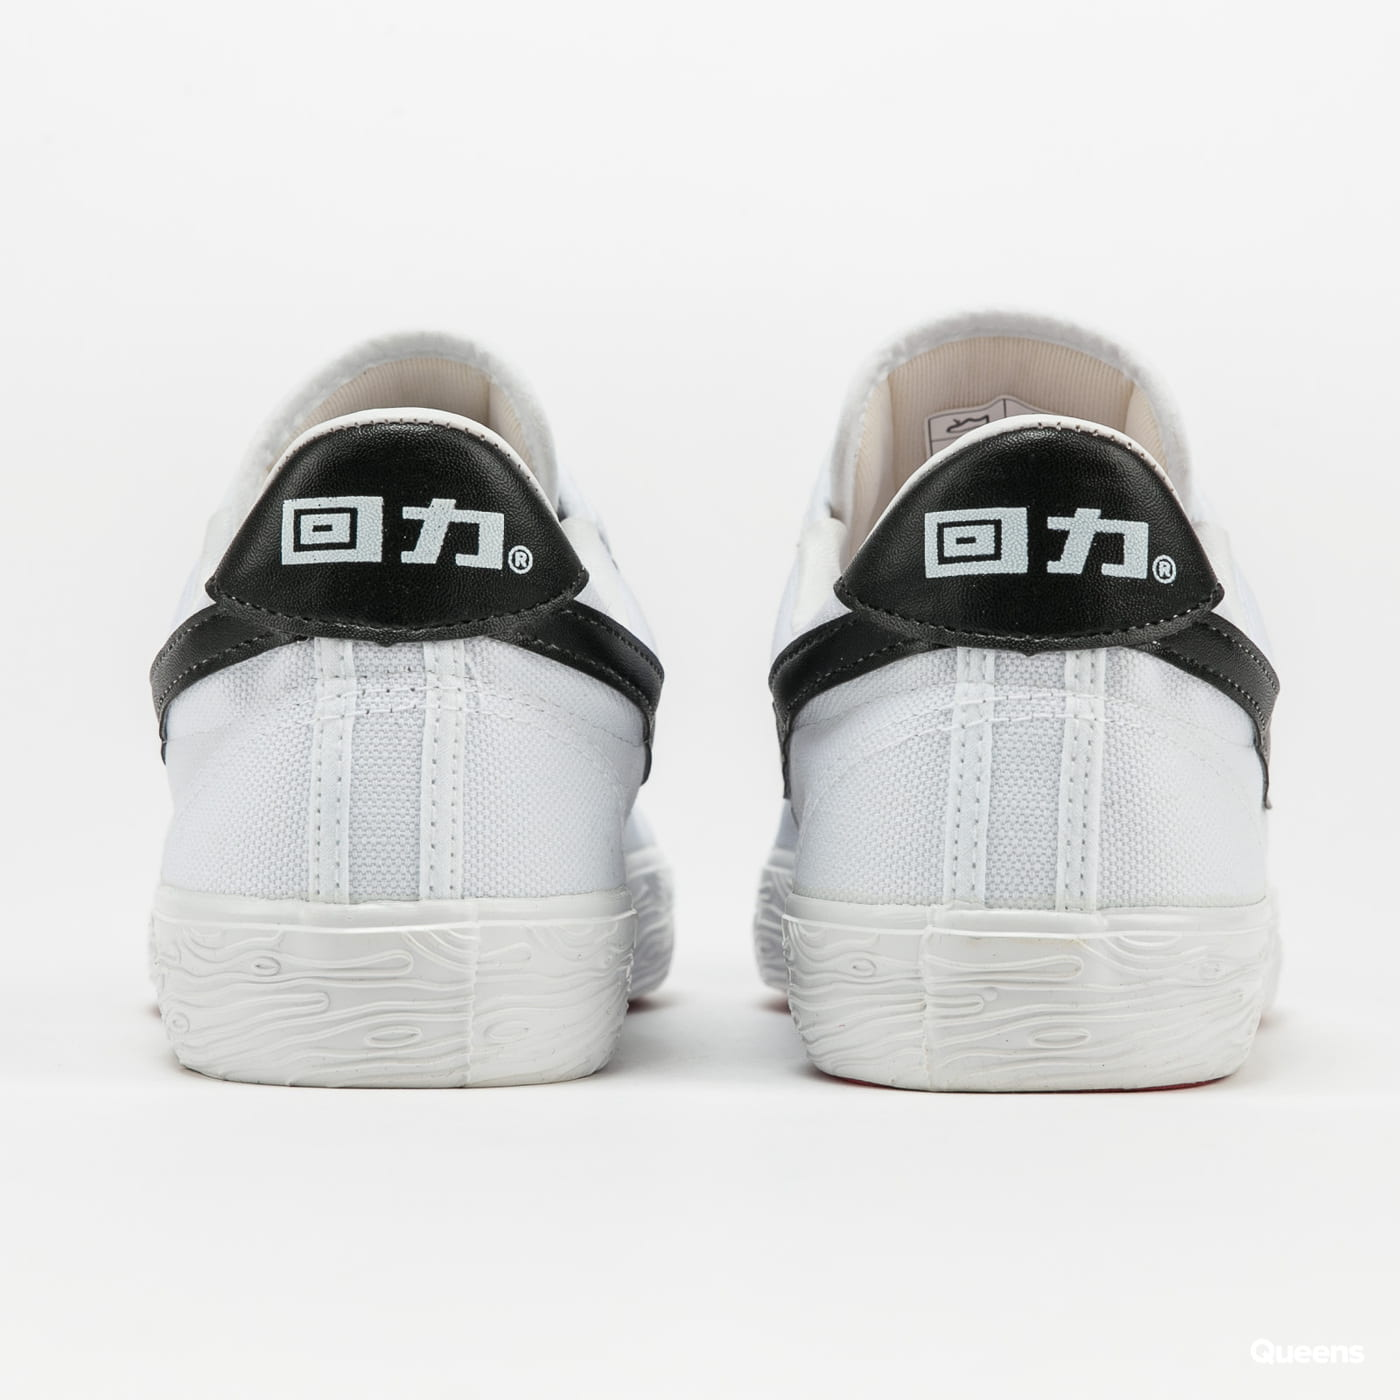 Warrior Shanghai WB-1 white / black